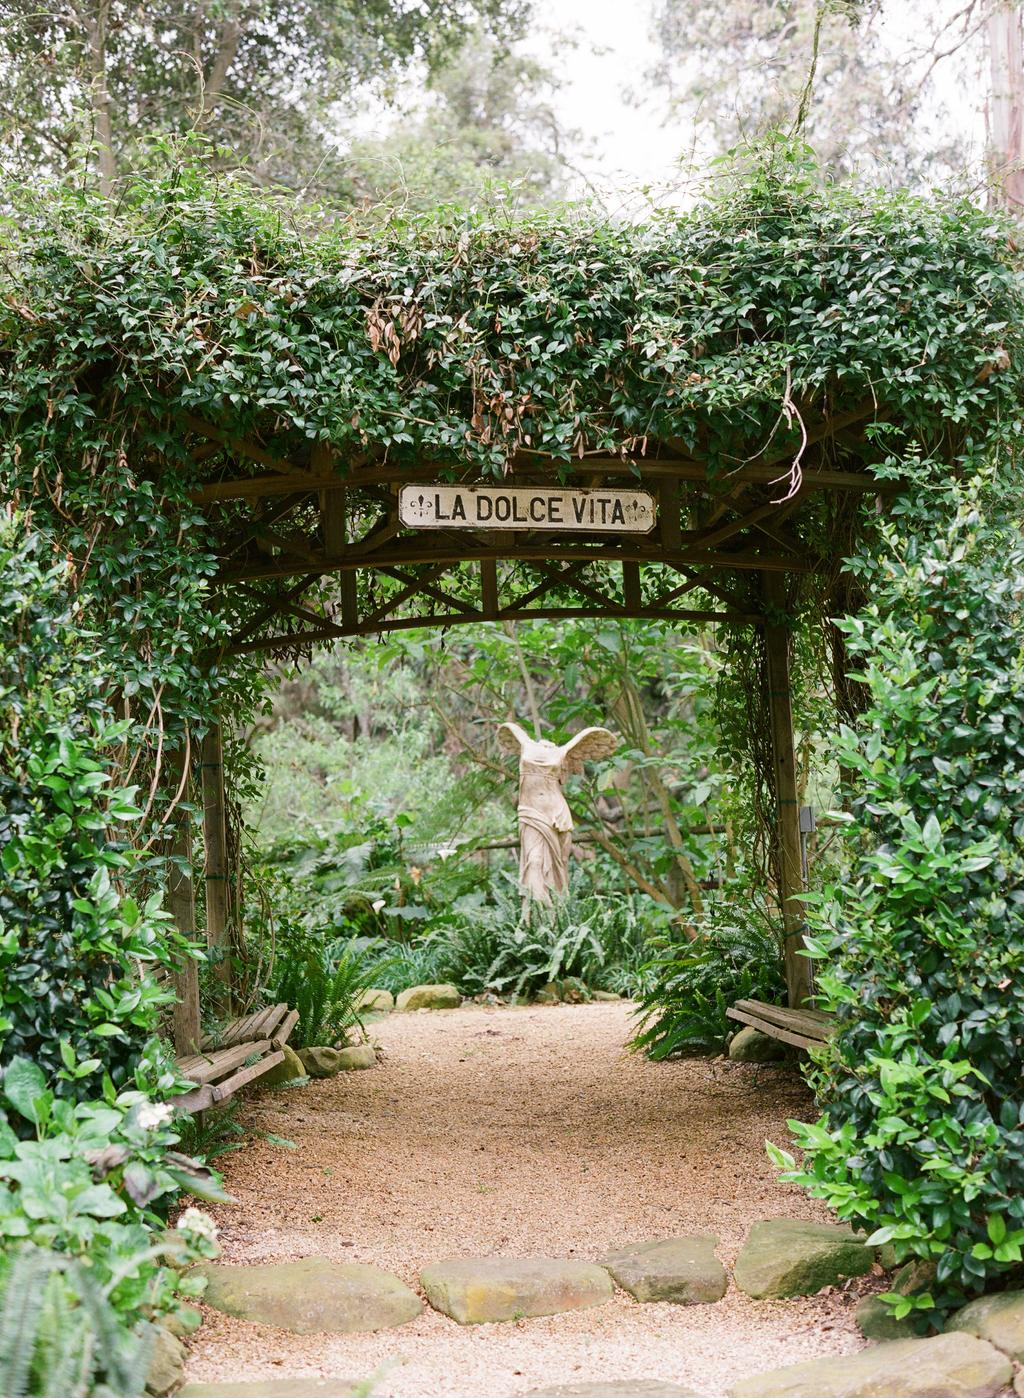 Styled-wedding-santa-barbara-chic-beaux-arts-photographie-italian-bohemian-wedding-venue-garden-006.full